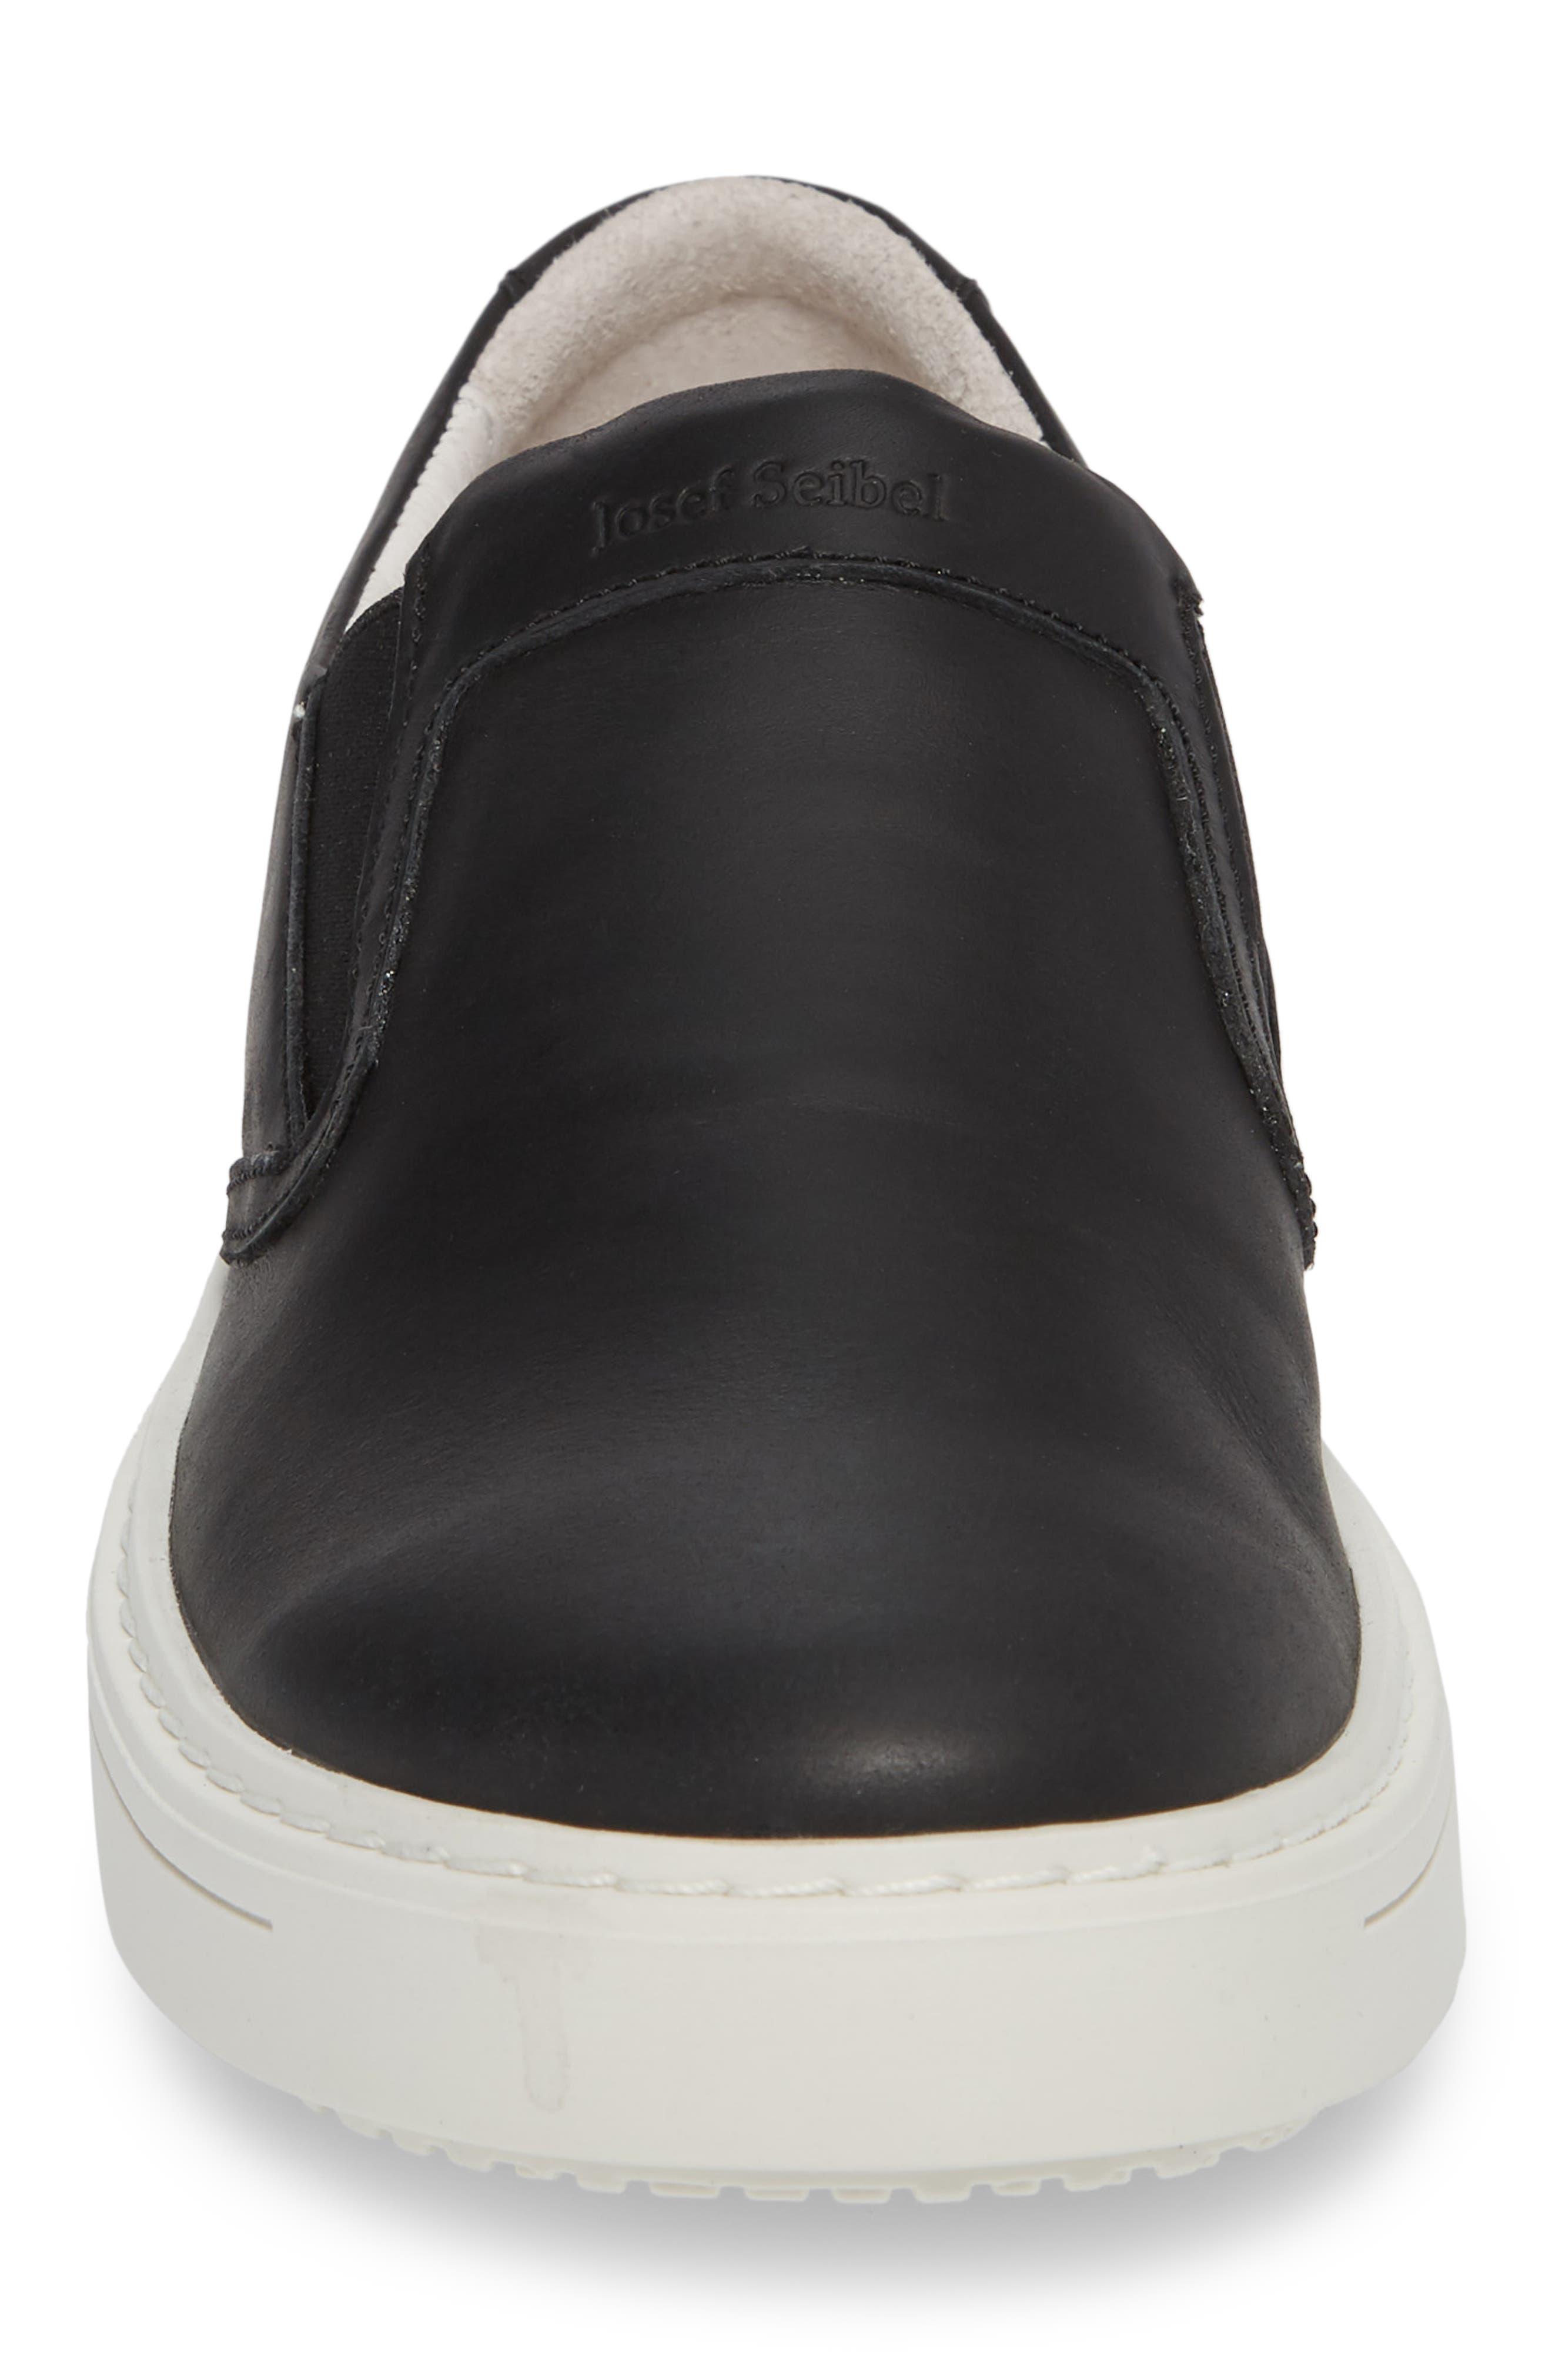 Quentin 15 Slip-On Sneaker,                             Alternate thumbnail 4, color,                             BLACK LEATHER